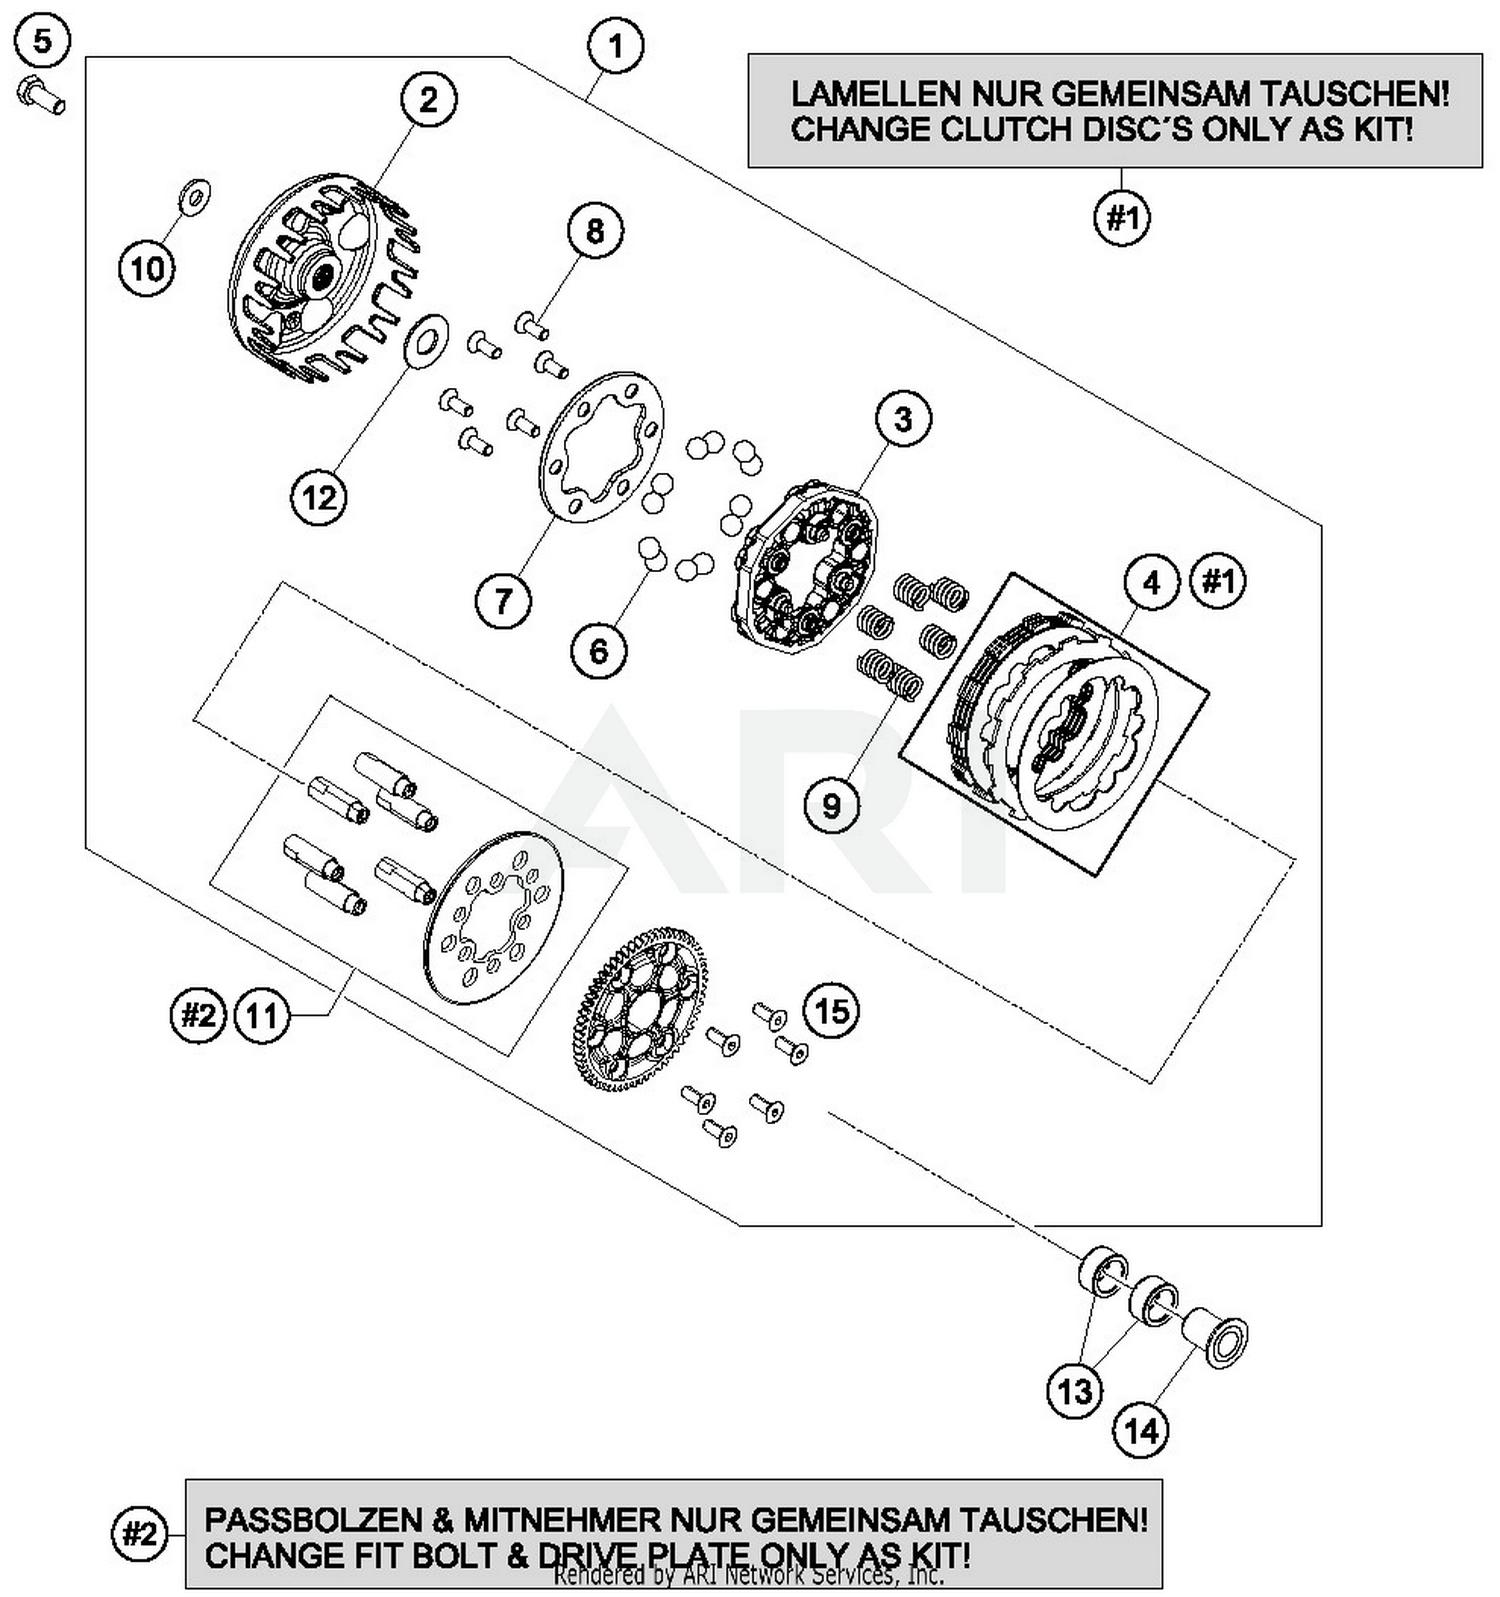 2016 ktm 50 sx mini clutch parts best oem clutch parts ktm 125 sx 2016 ktm 50 sx wiring diagram #6